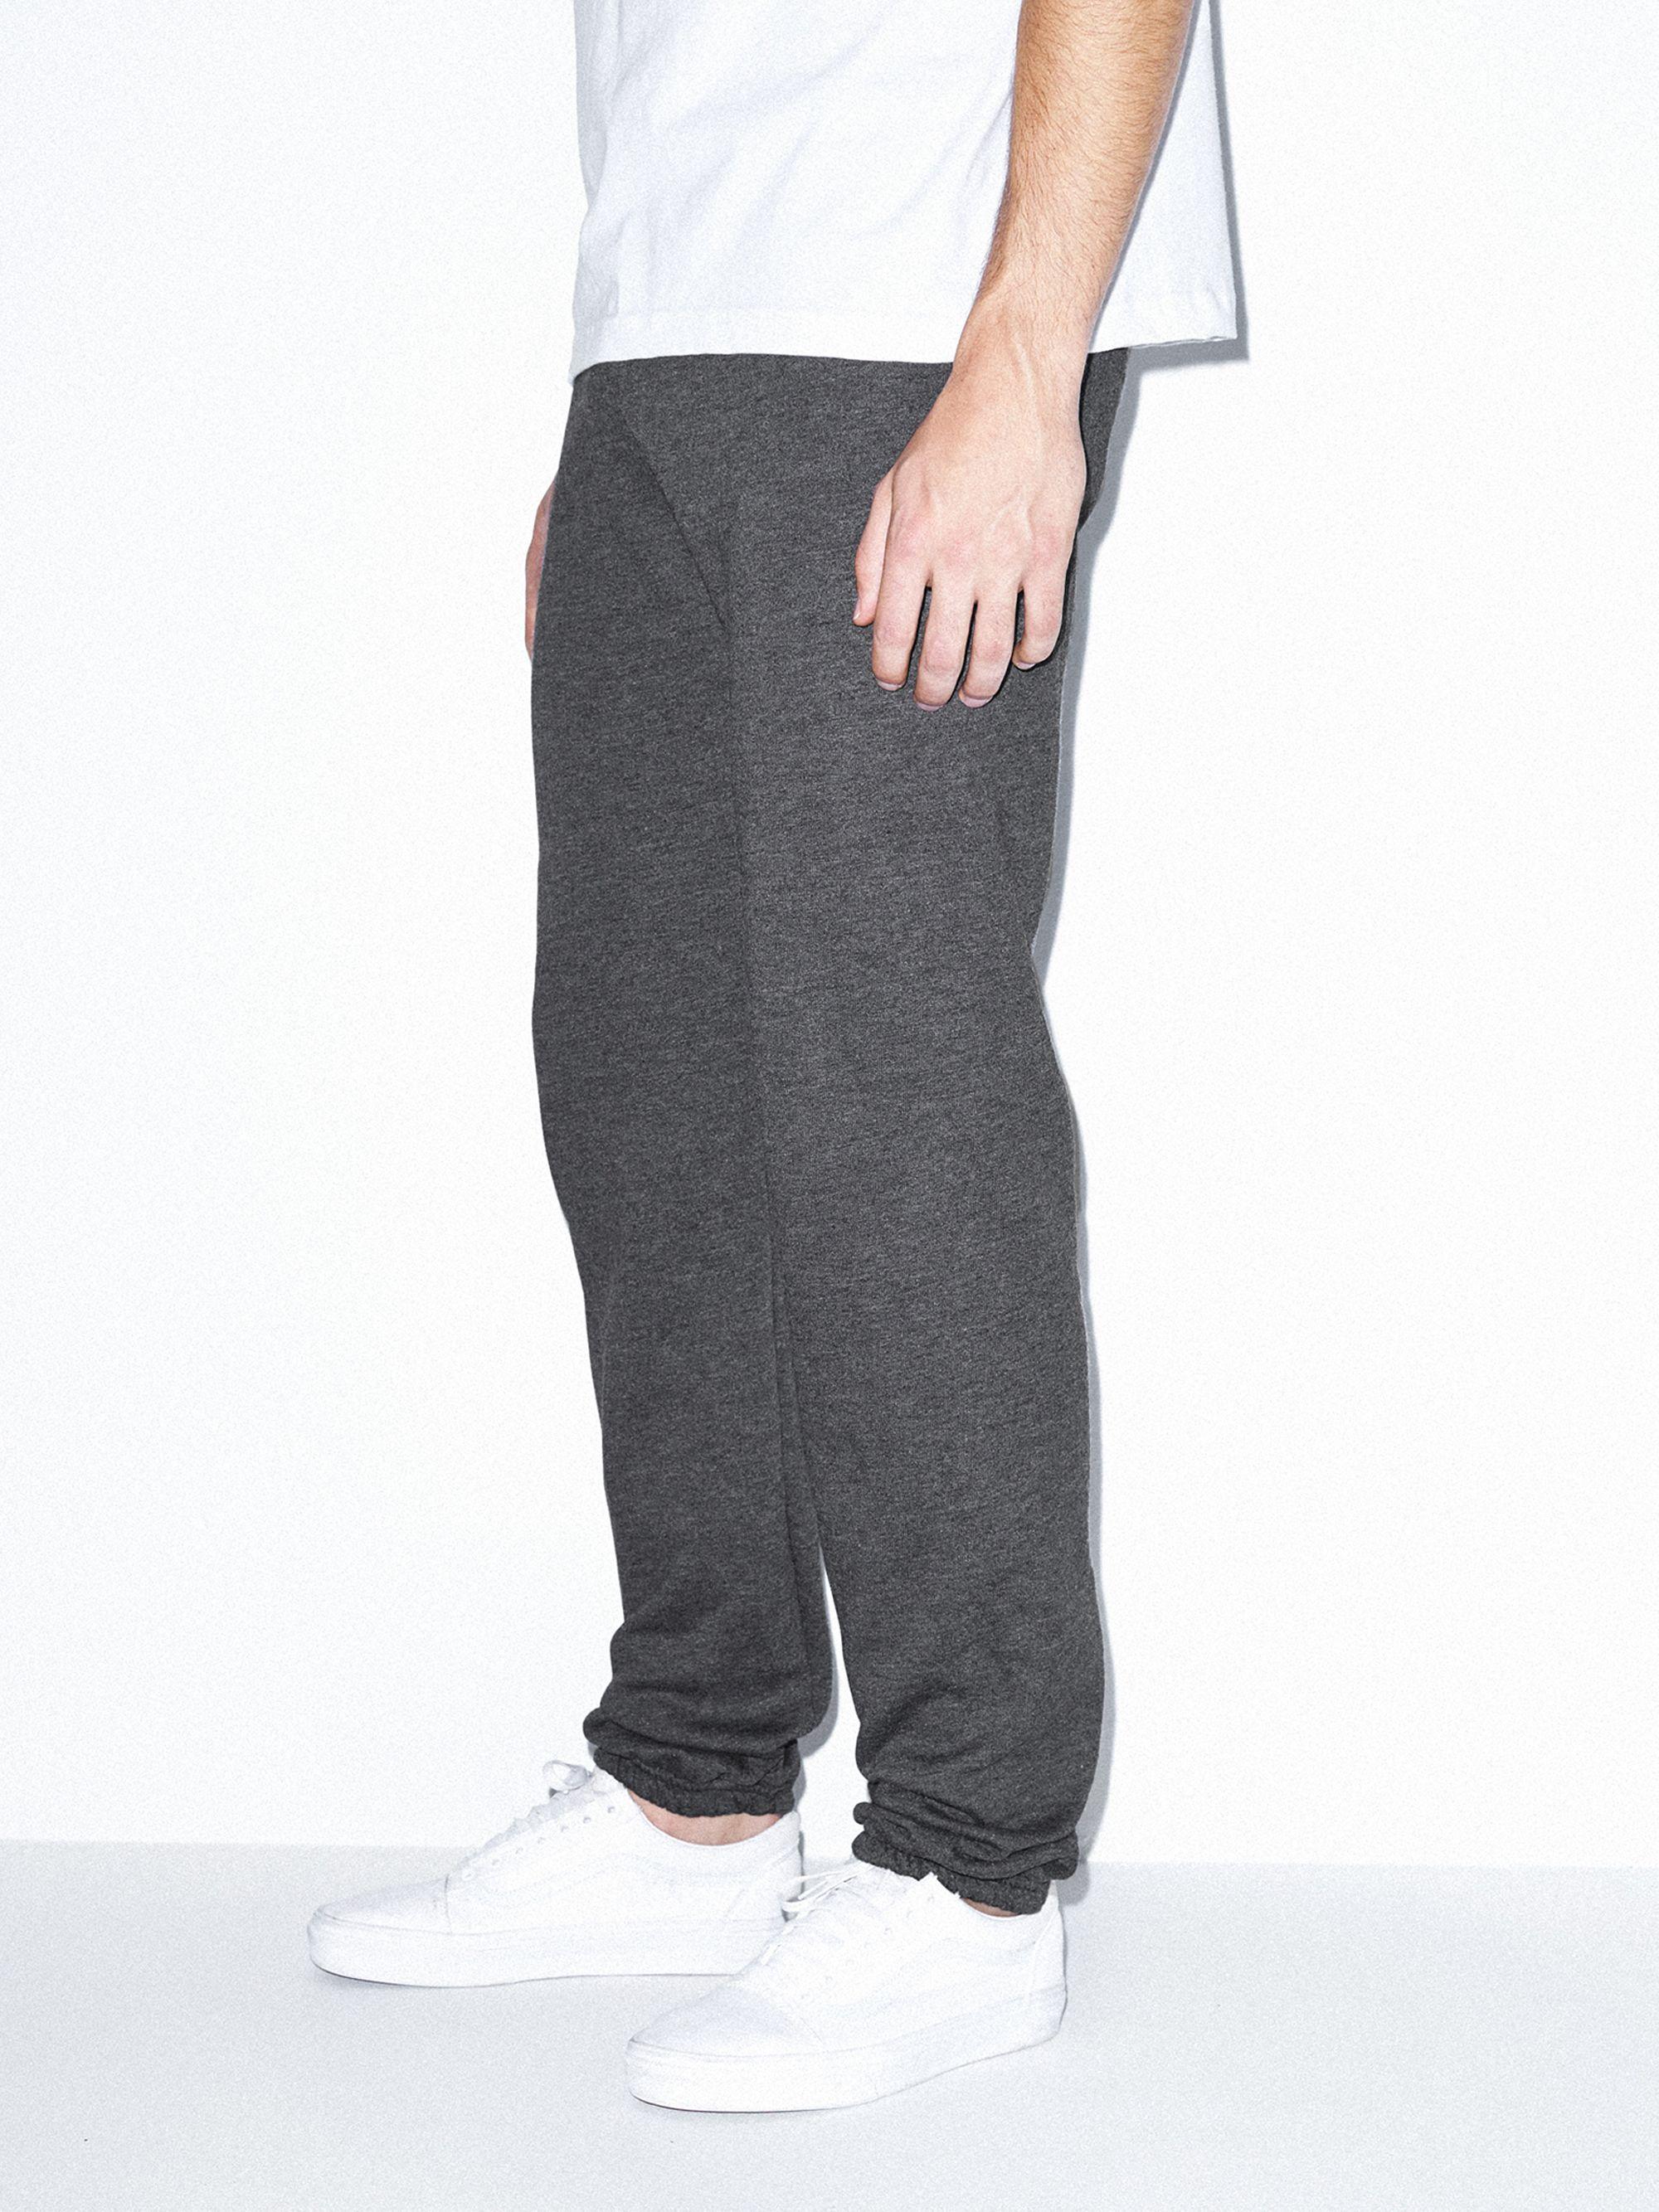 618341b8f49 Flex Fleece Sweatpant   American Apparel